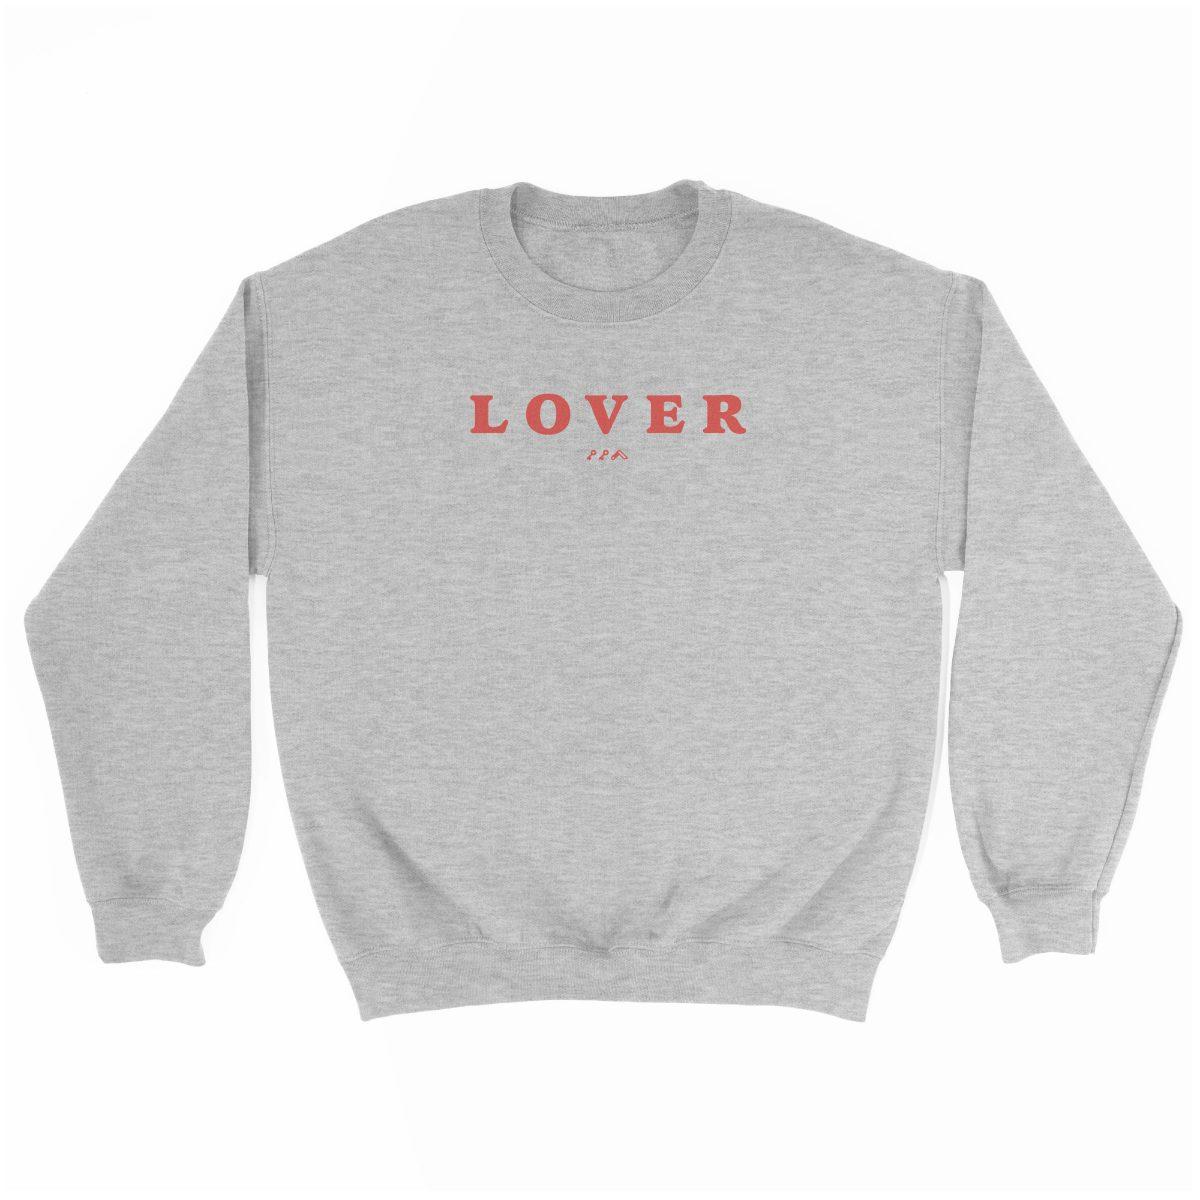 LOVER super soft unisex sweatshirt in grey at kikicutt.com